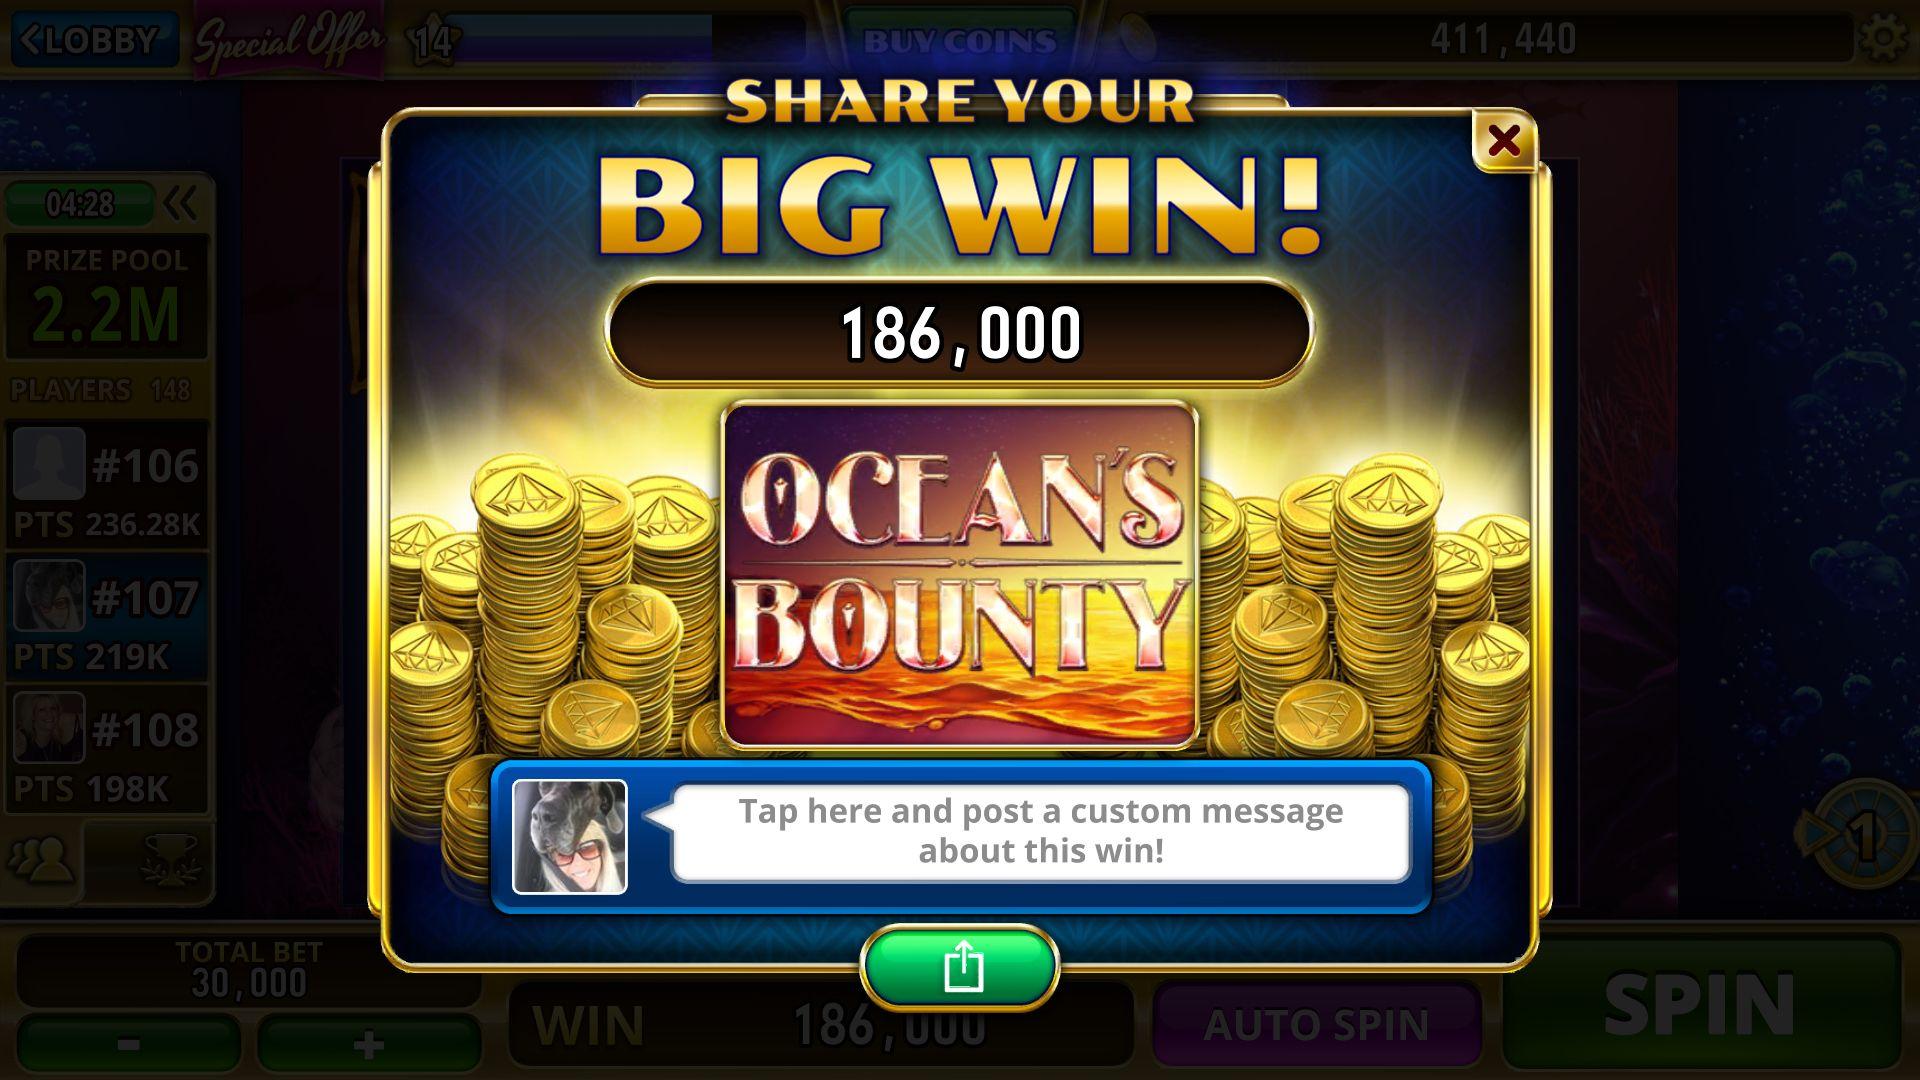 I won a big win on oceans bounty i win custom message big